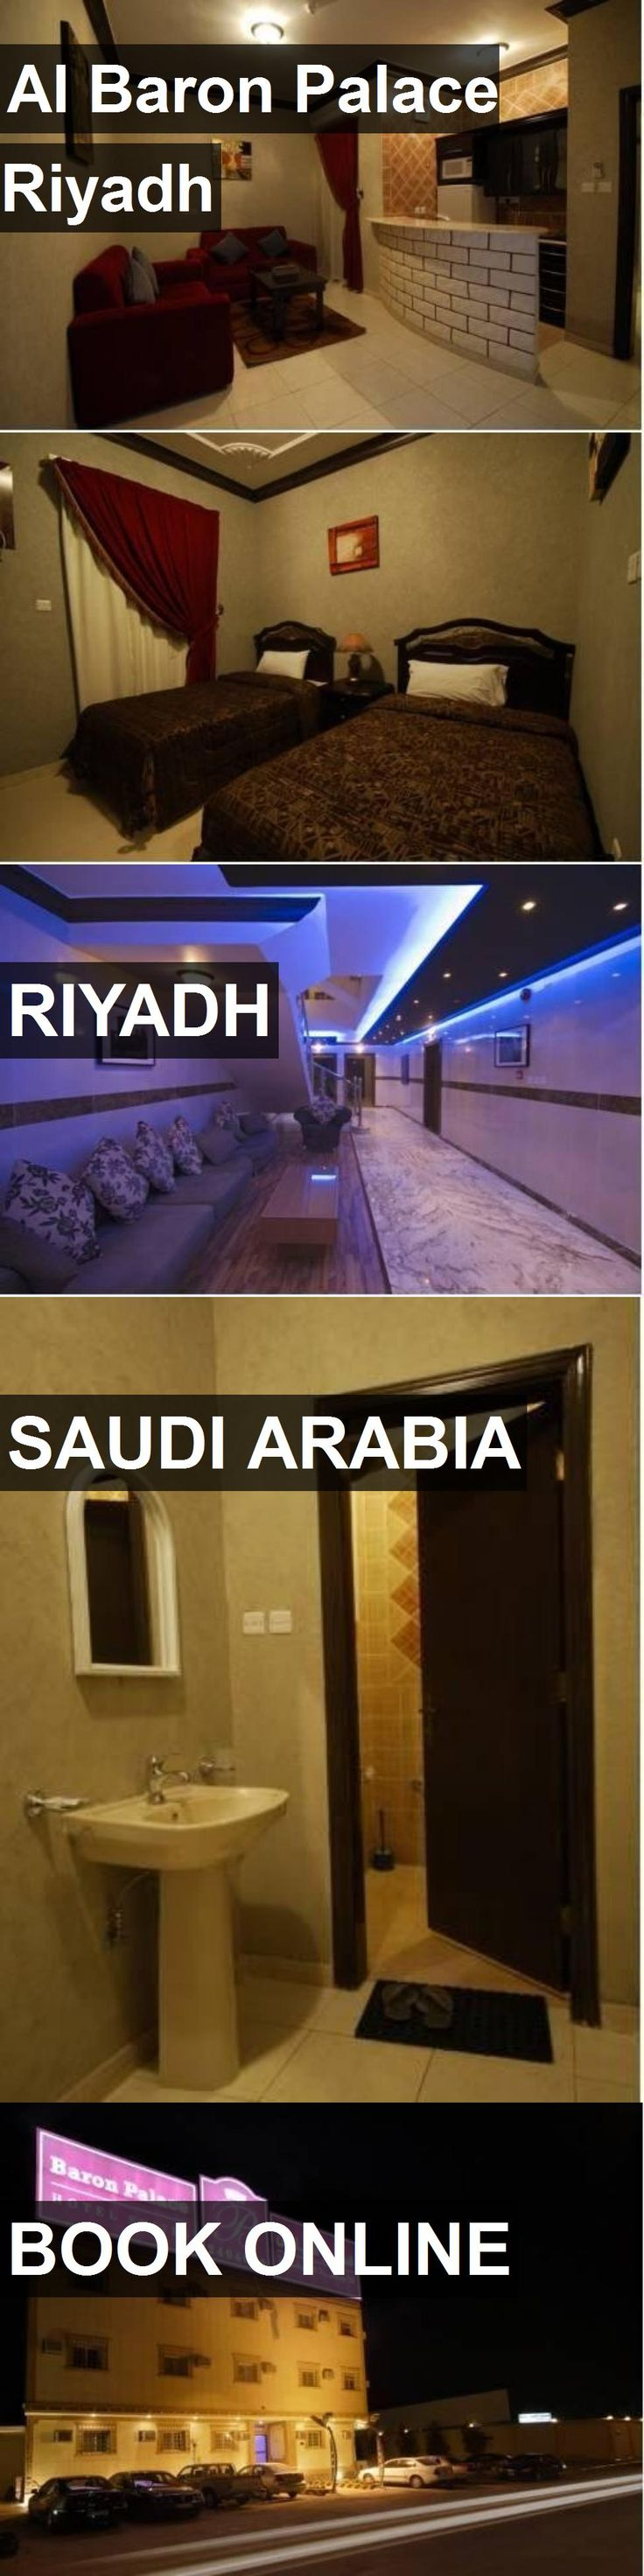 Hotel Al Baron Palace Riyadh in Riyadh, Saudi Arabia. For more information, photos, reviews and best prices please follow the link. #SaudiArabia #Riyadh #travel #vacation #hotel